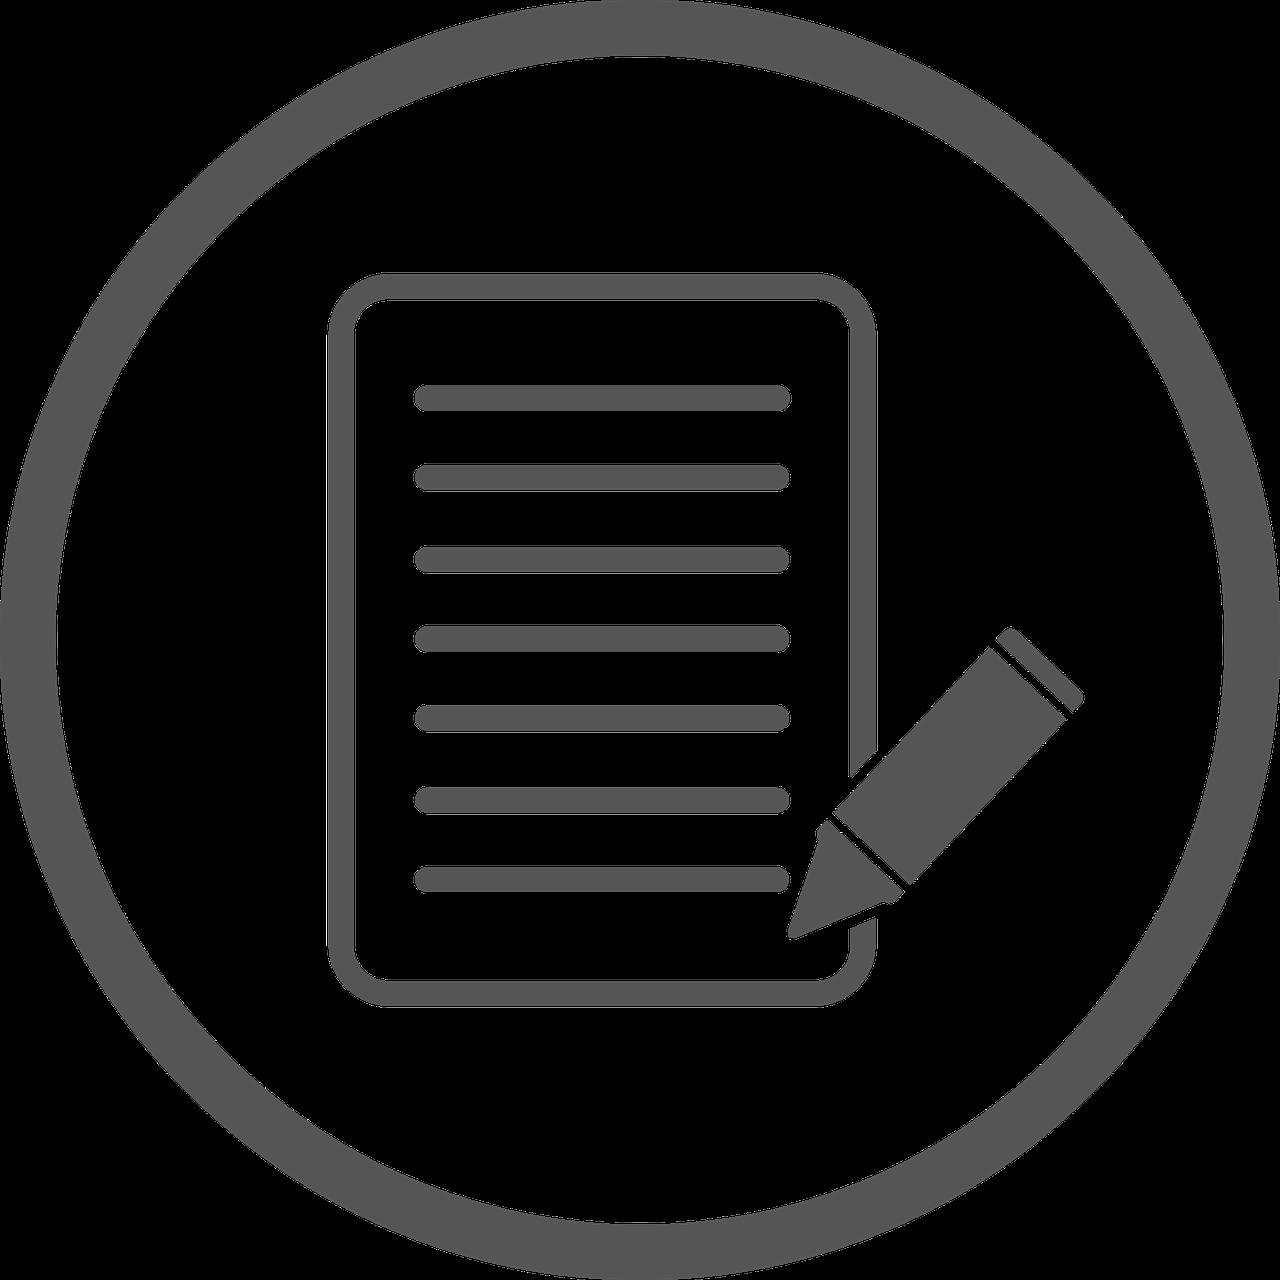 Icon representing writing